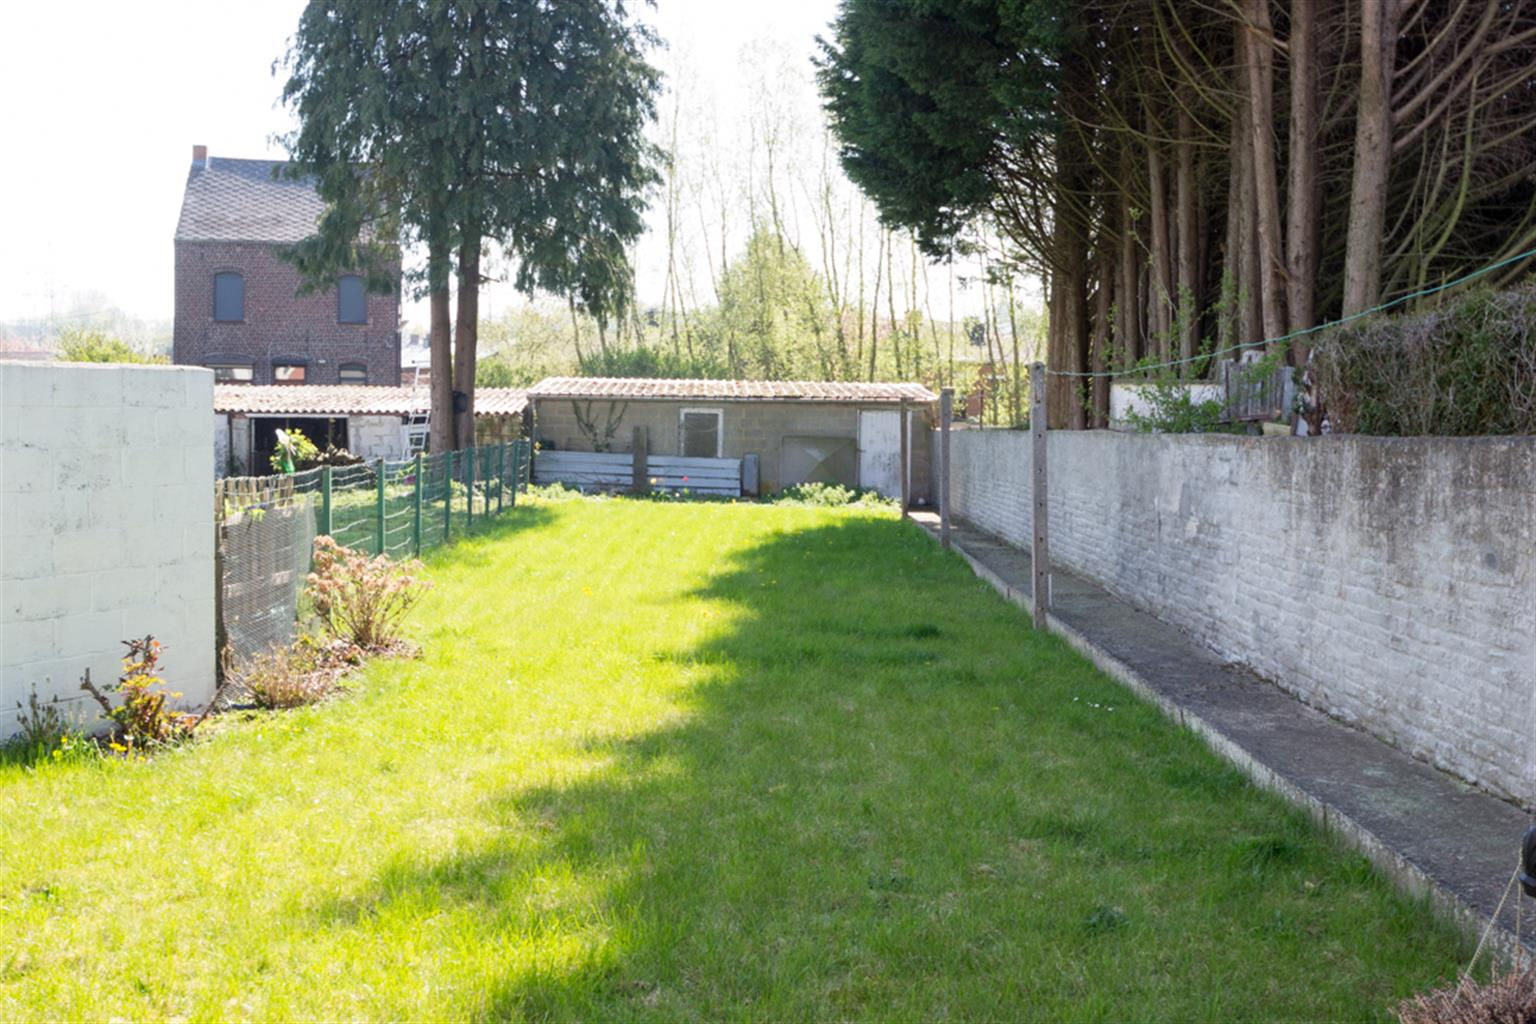 Maison - Leval-Trahegnies - #4345091-8